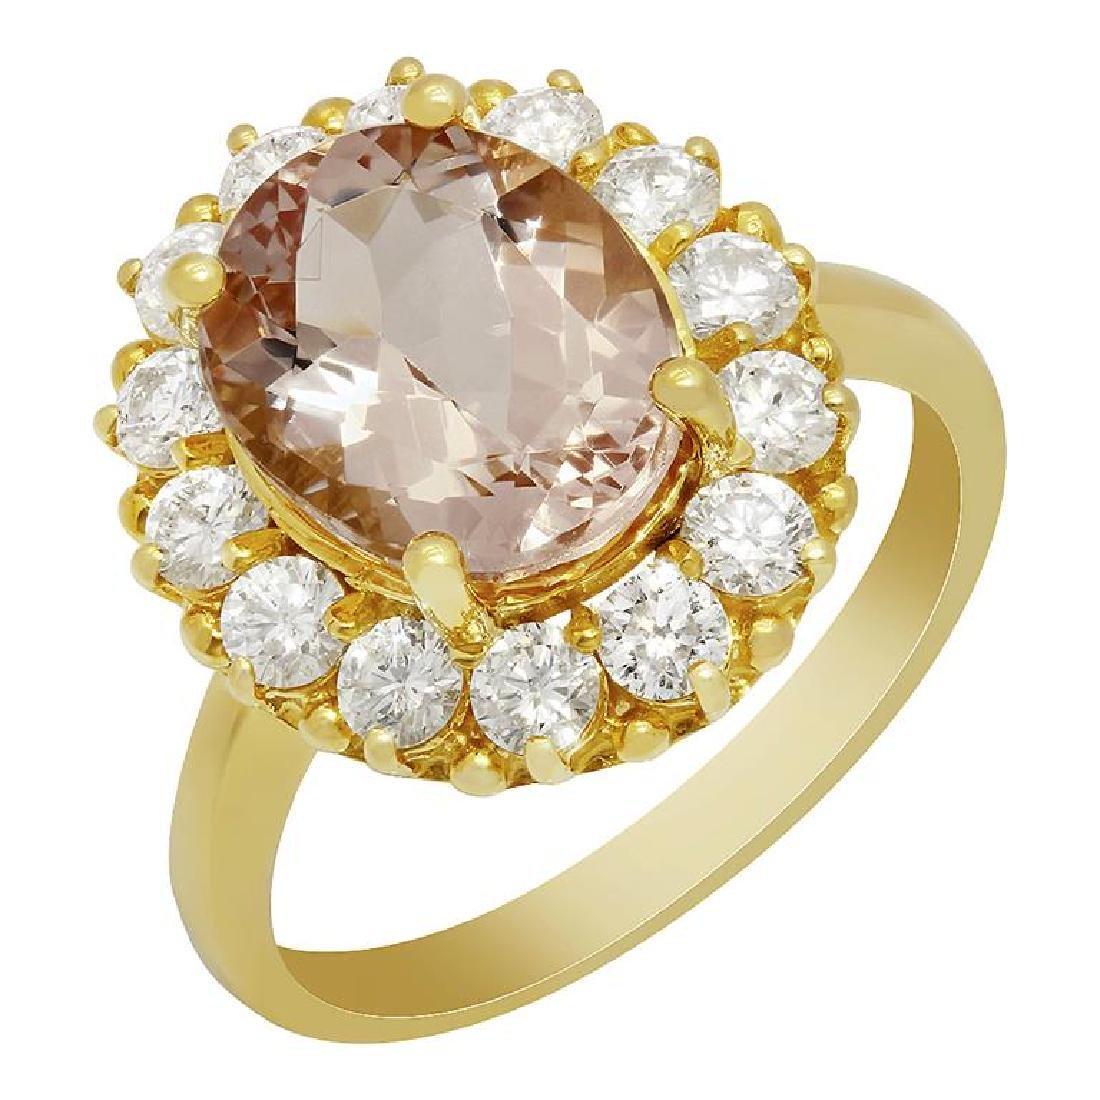 14k Yellow Gold 3.36ct Morganite 1.13ct Diamond Ring